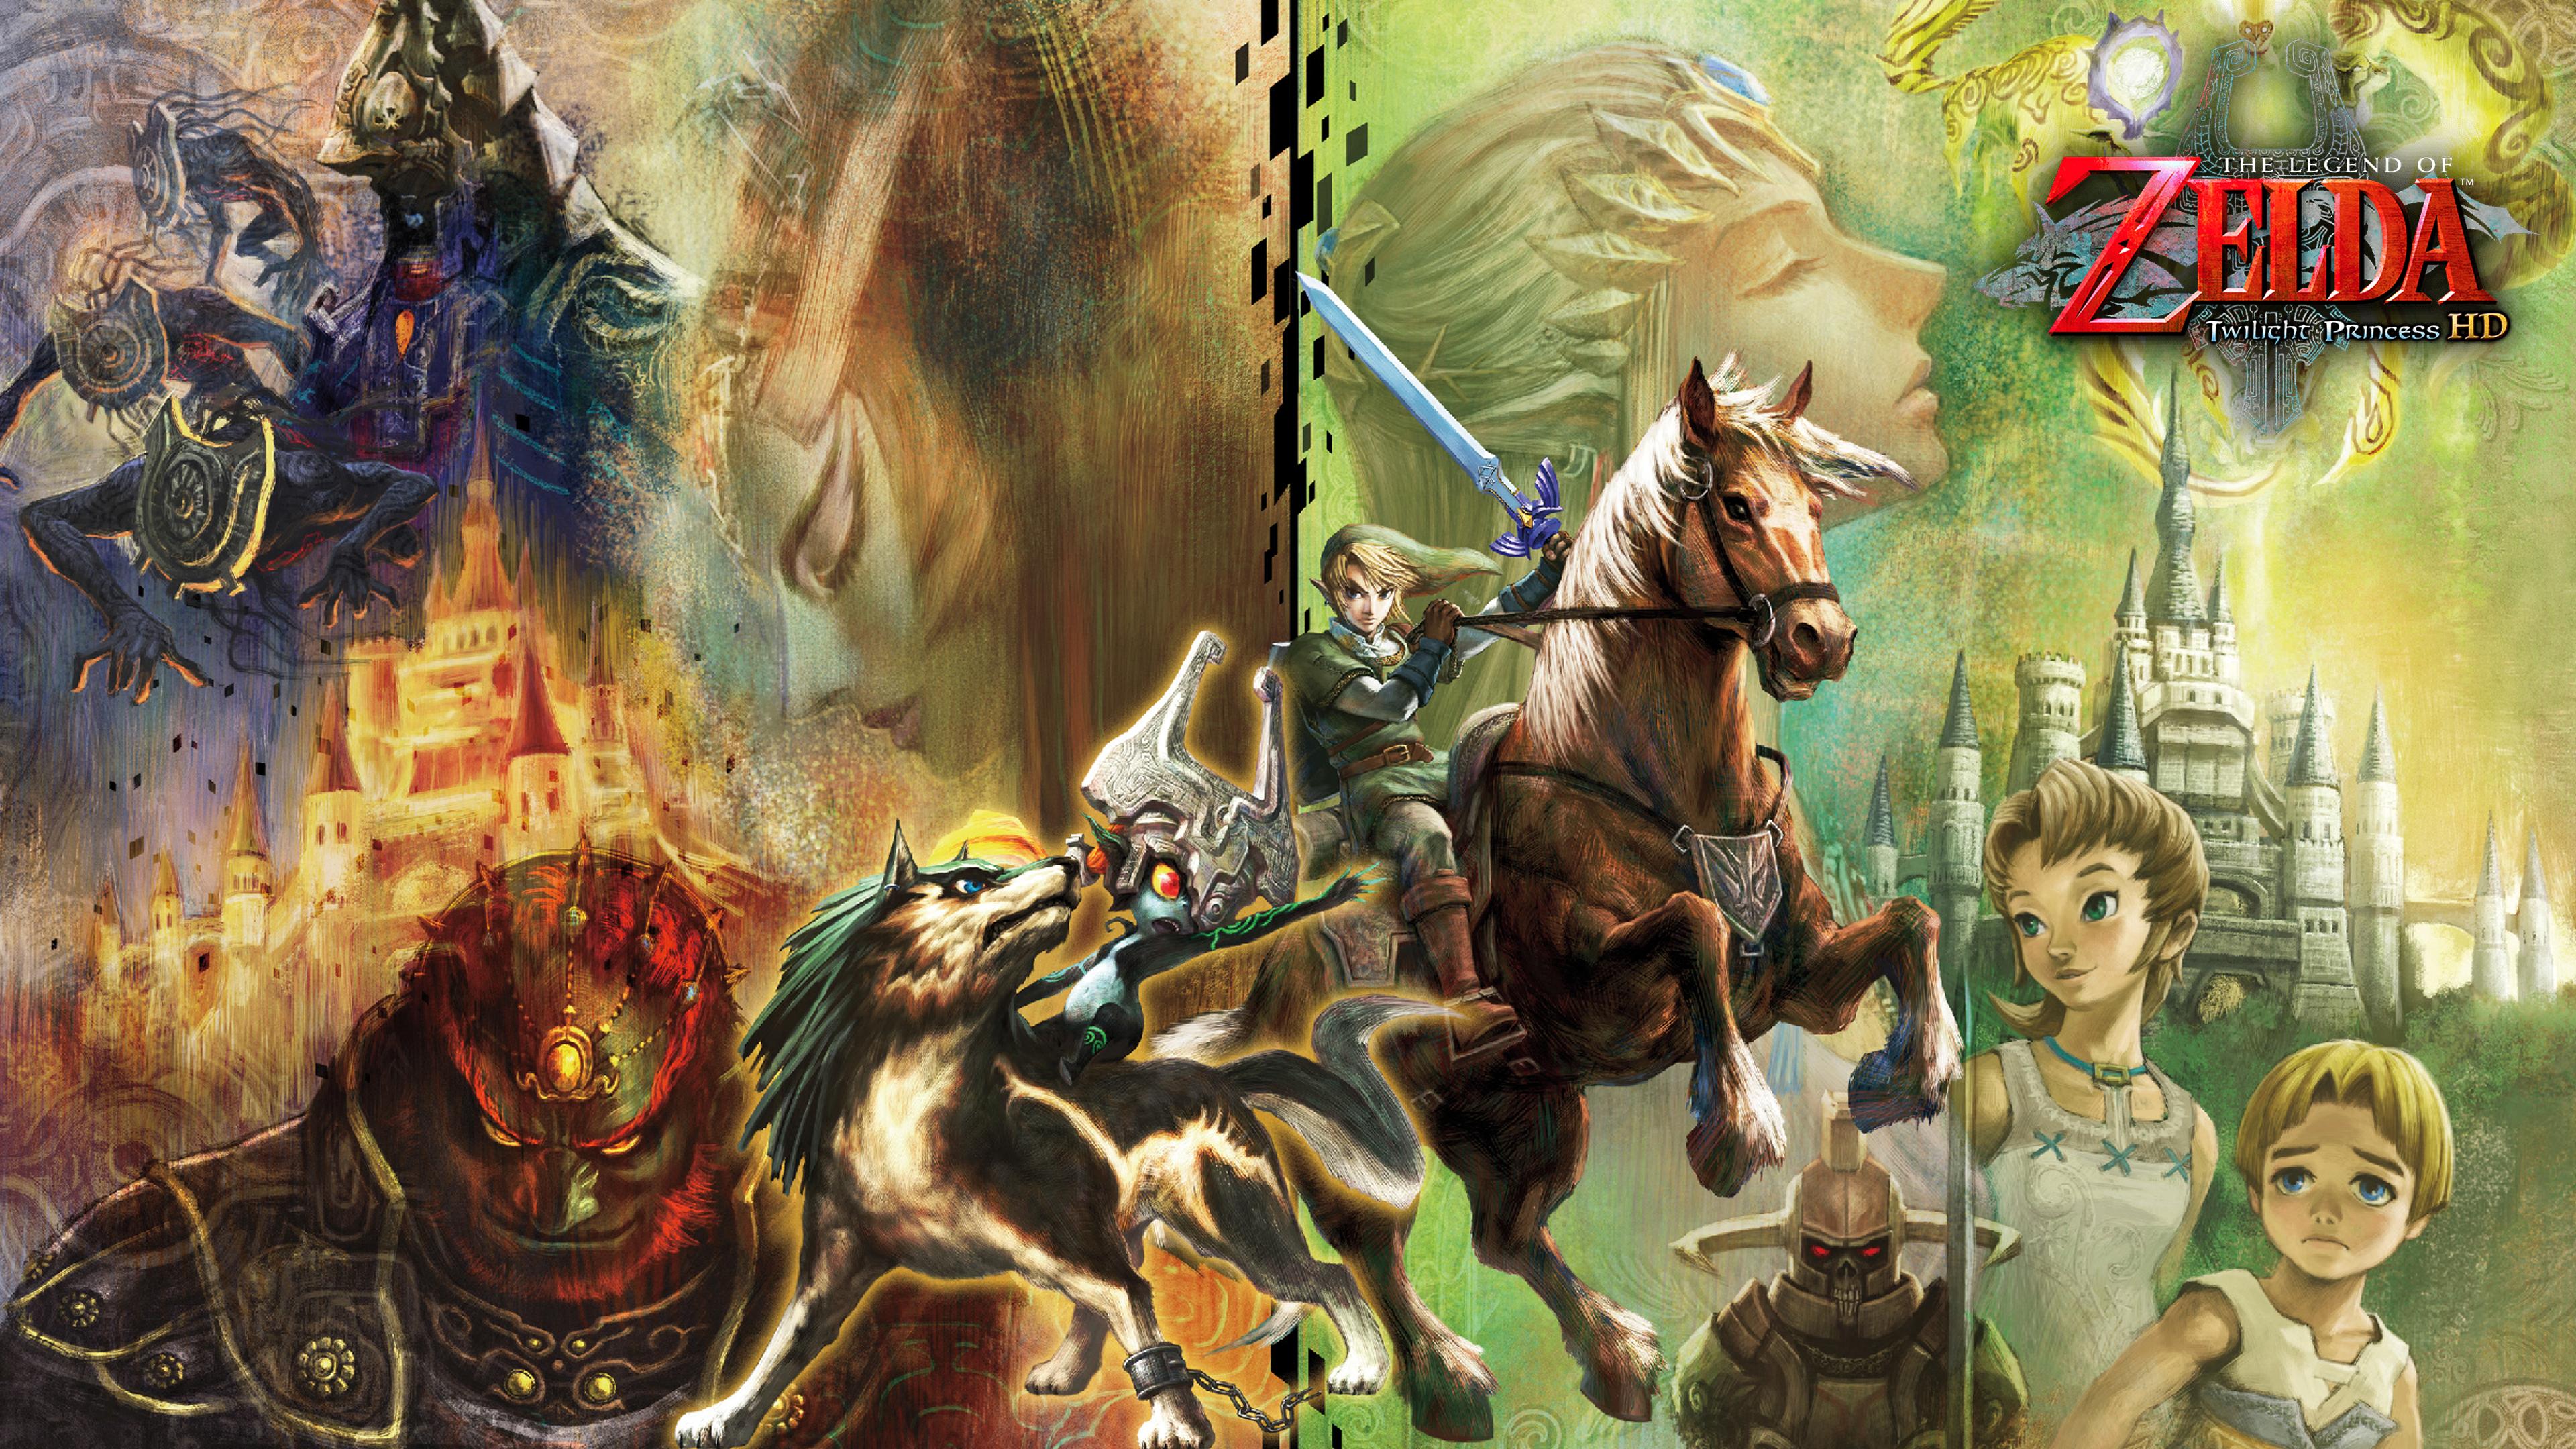 7 4k Ultra Hd The Legend Of Zelda Twilight Princess Wallpapers